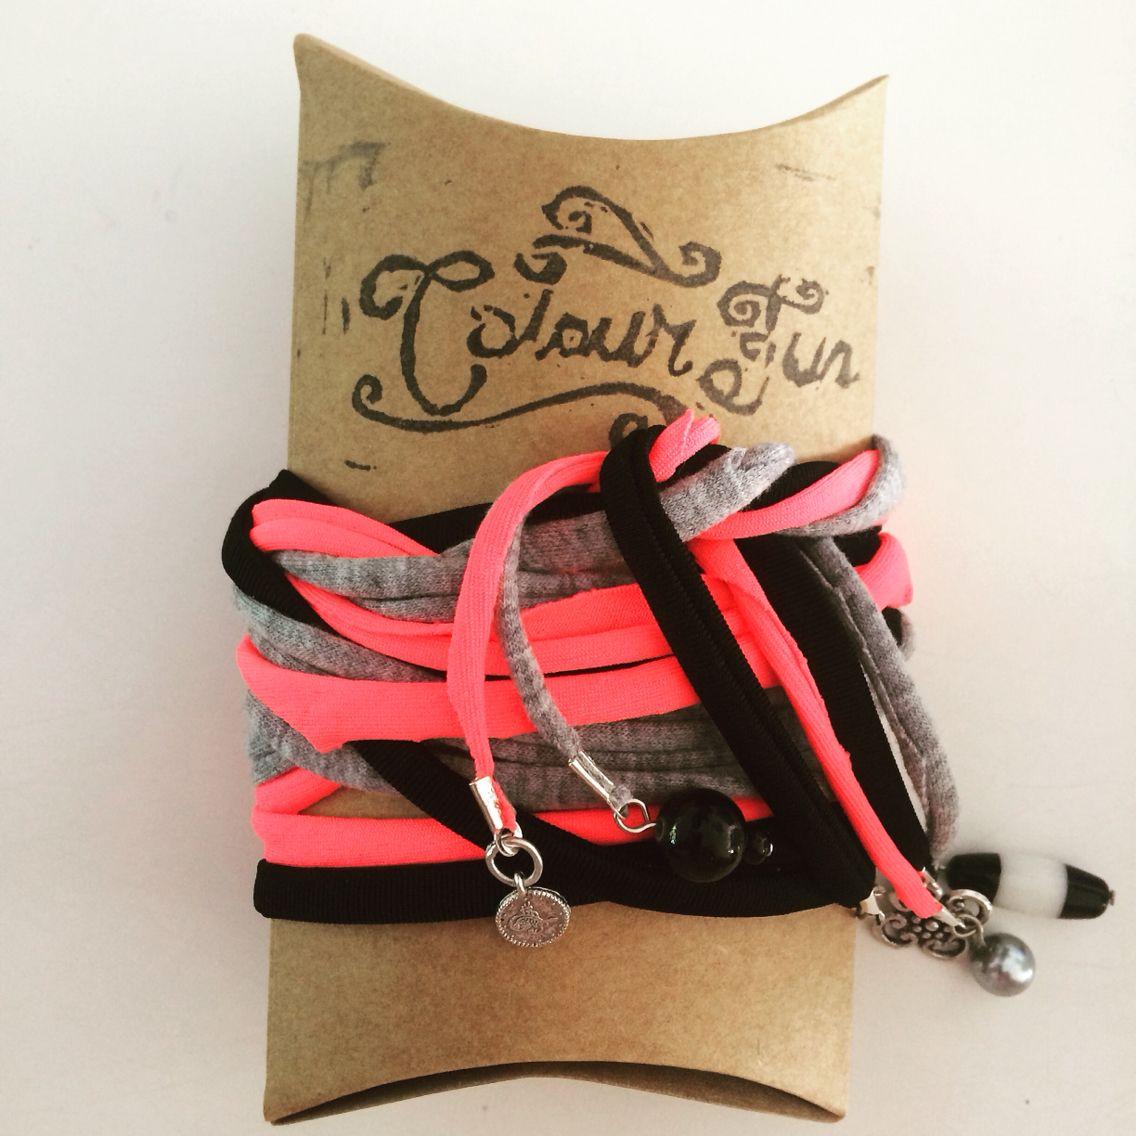 Bandjes Limited Edition by Colourfun voor Chula Sandals / Slippers te bestellen via info@colourfun.nl